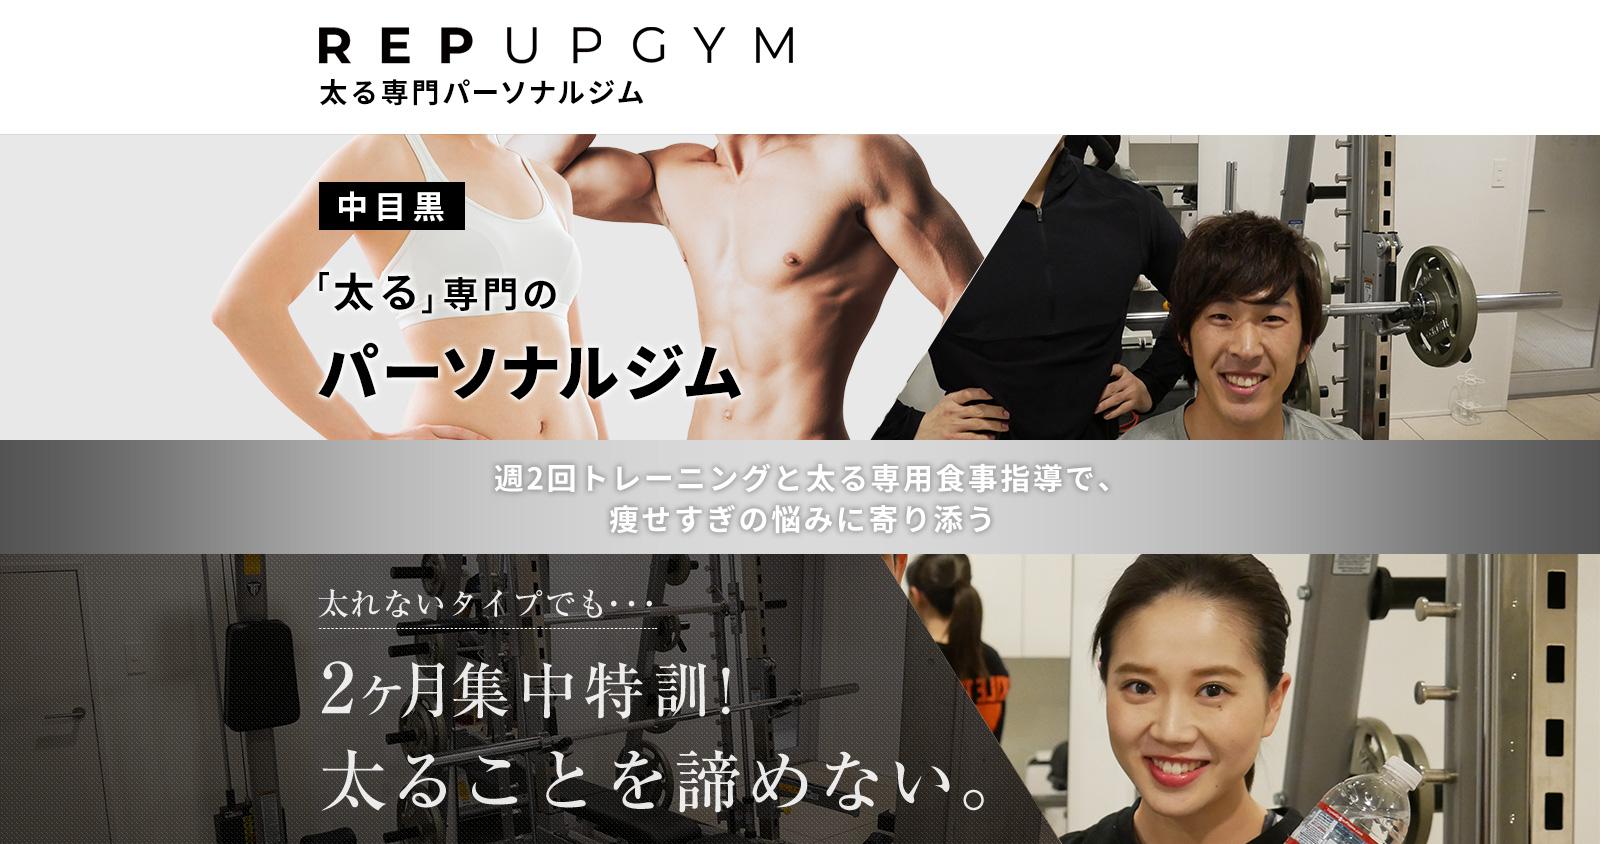 REP UP GYM 太る専門